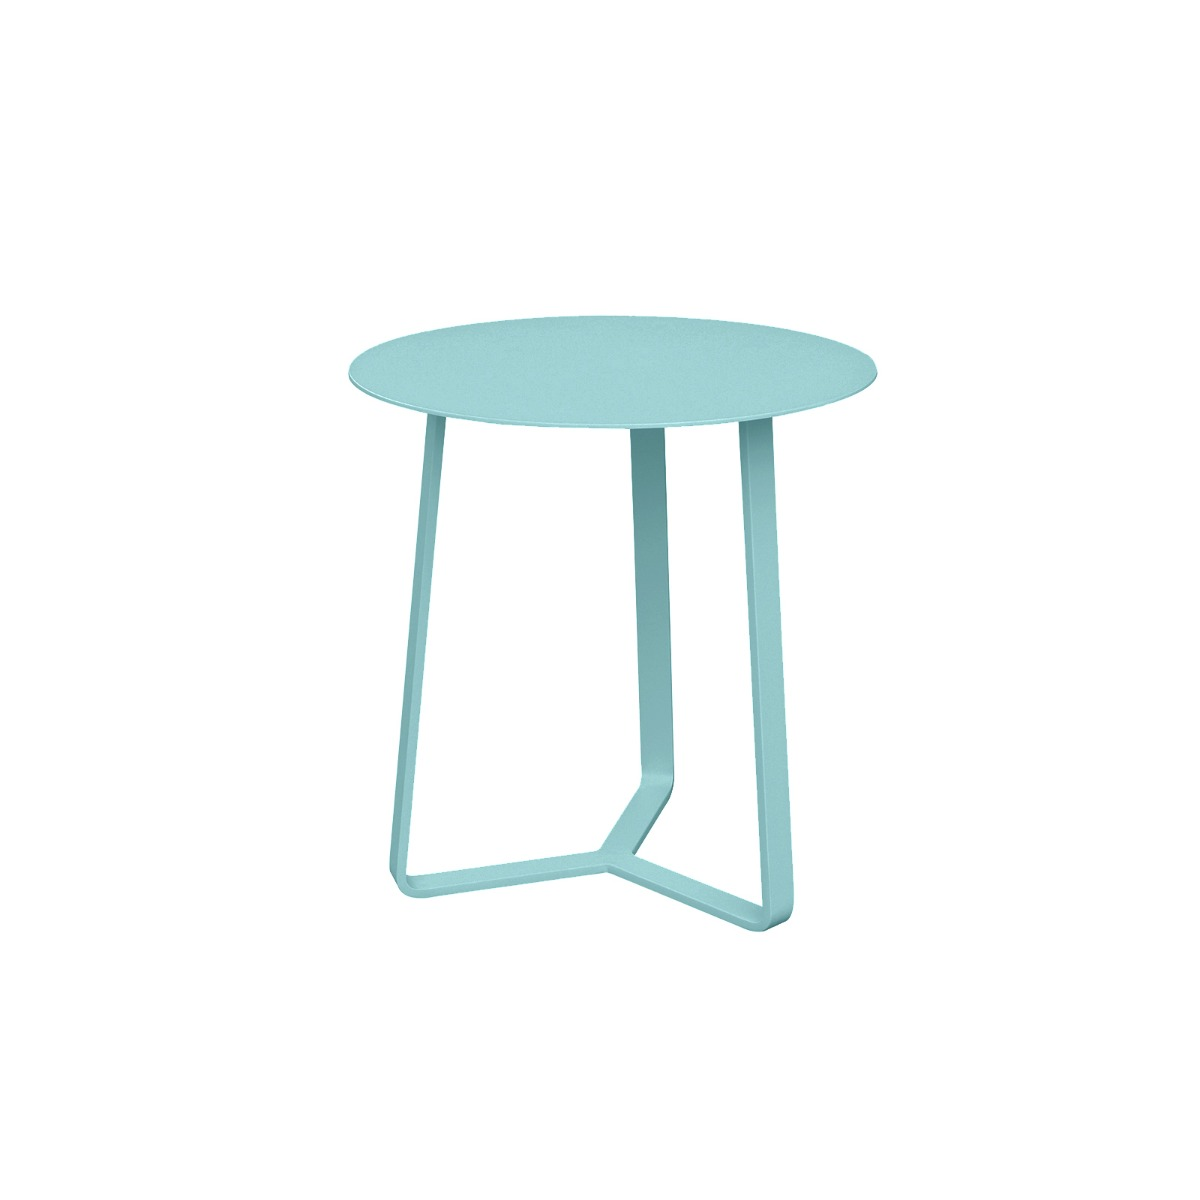 Apollo Aluminium Large Side Table in Teal Blue